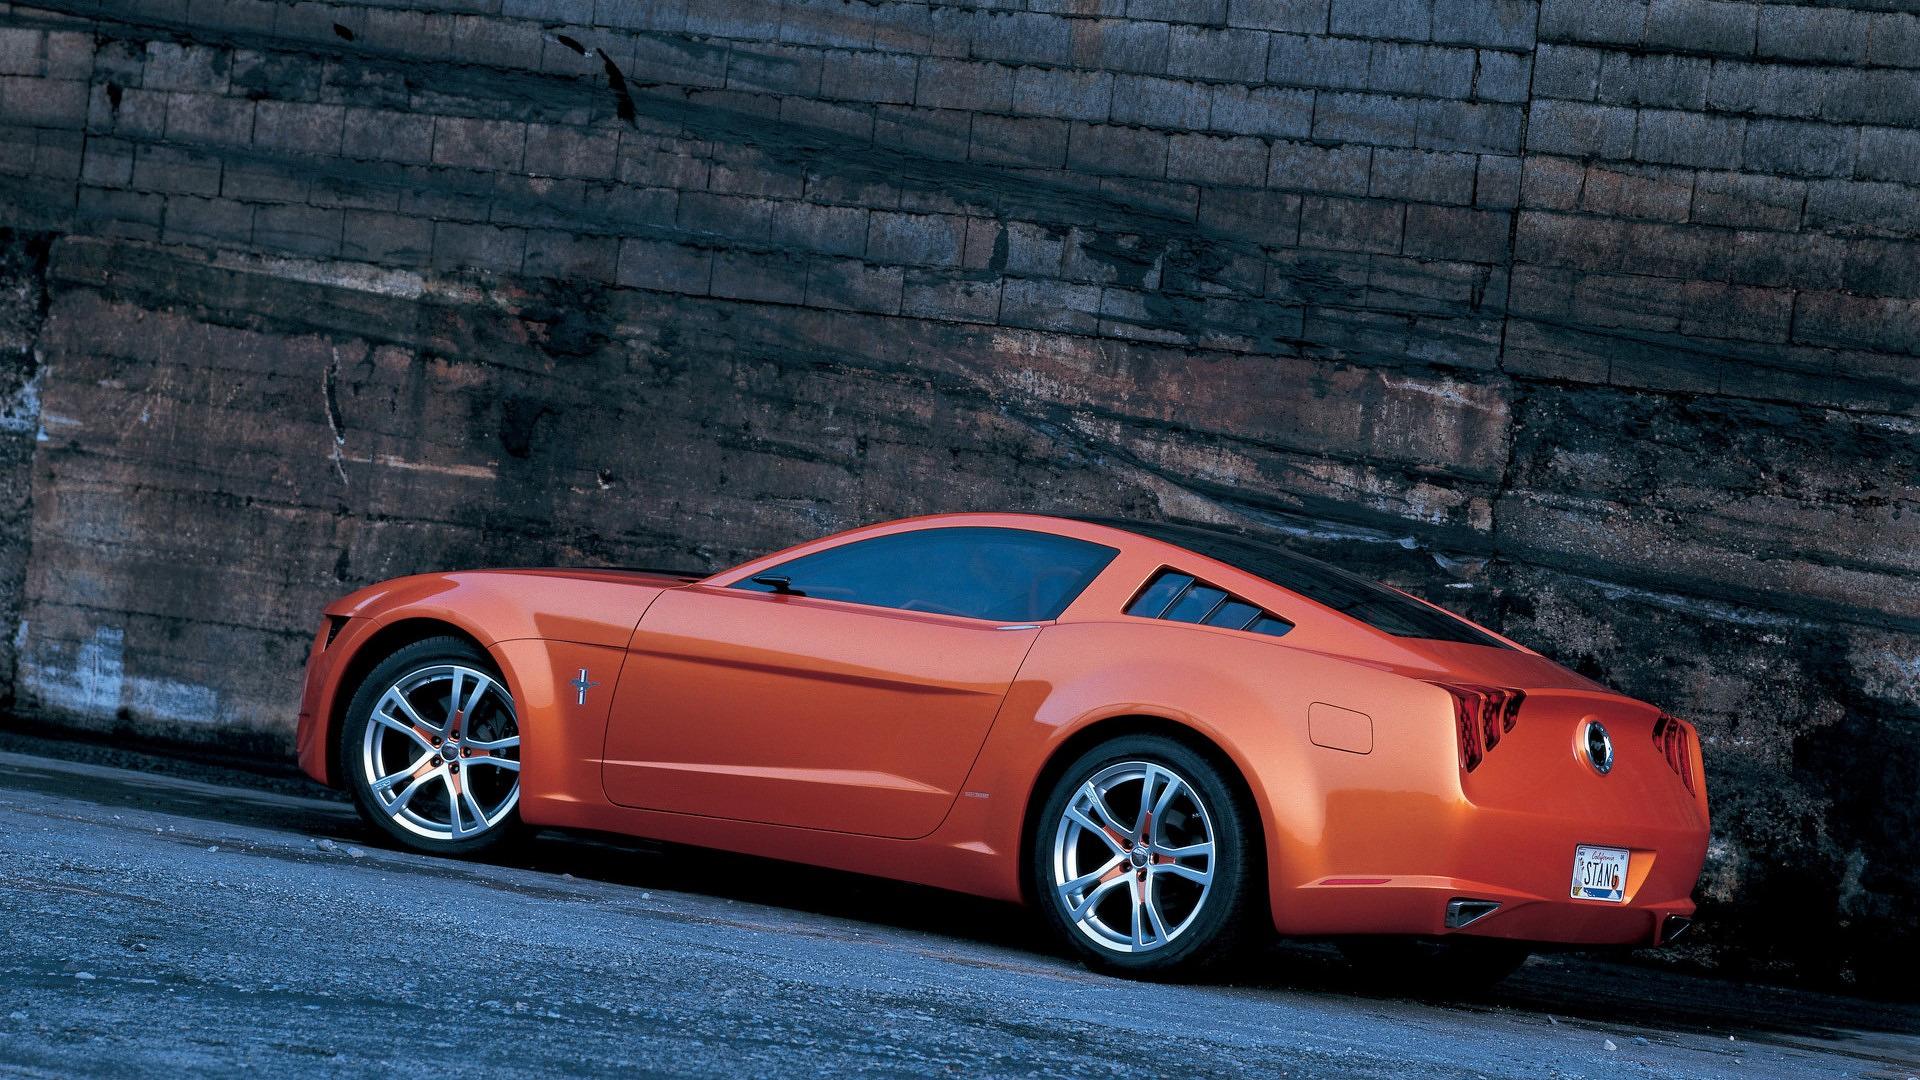 2006-ford-mustang-giugiaro-concept (16)